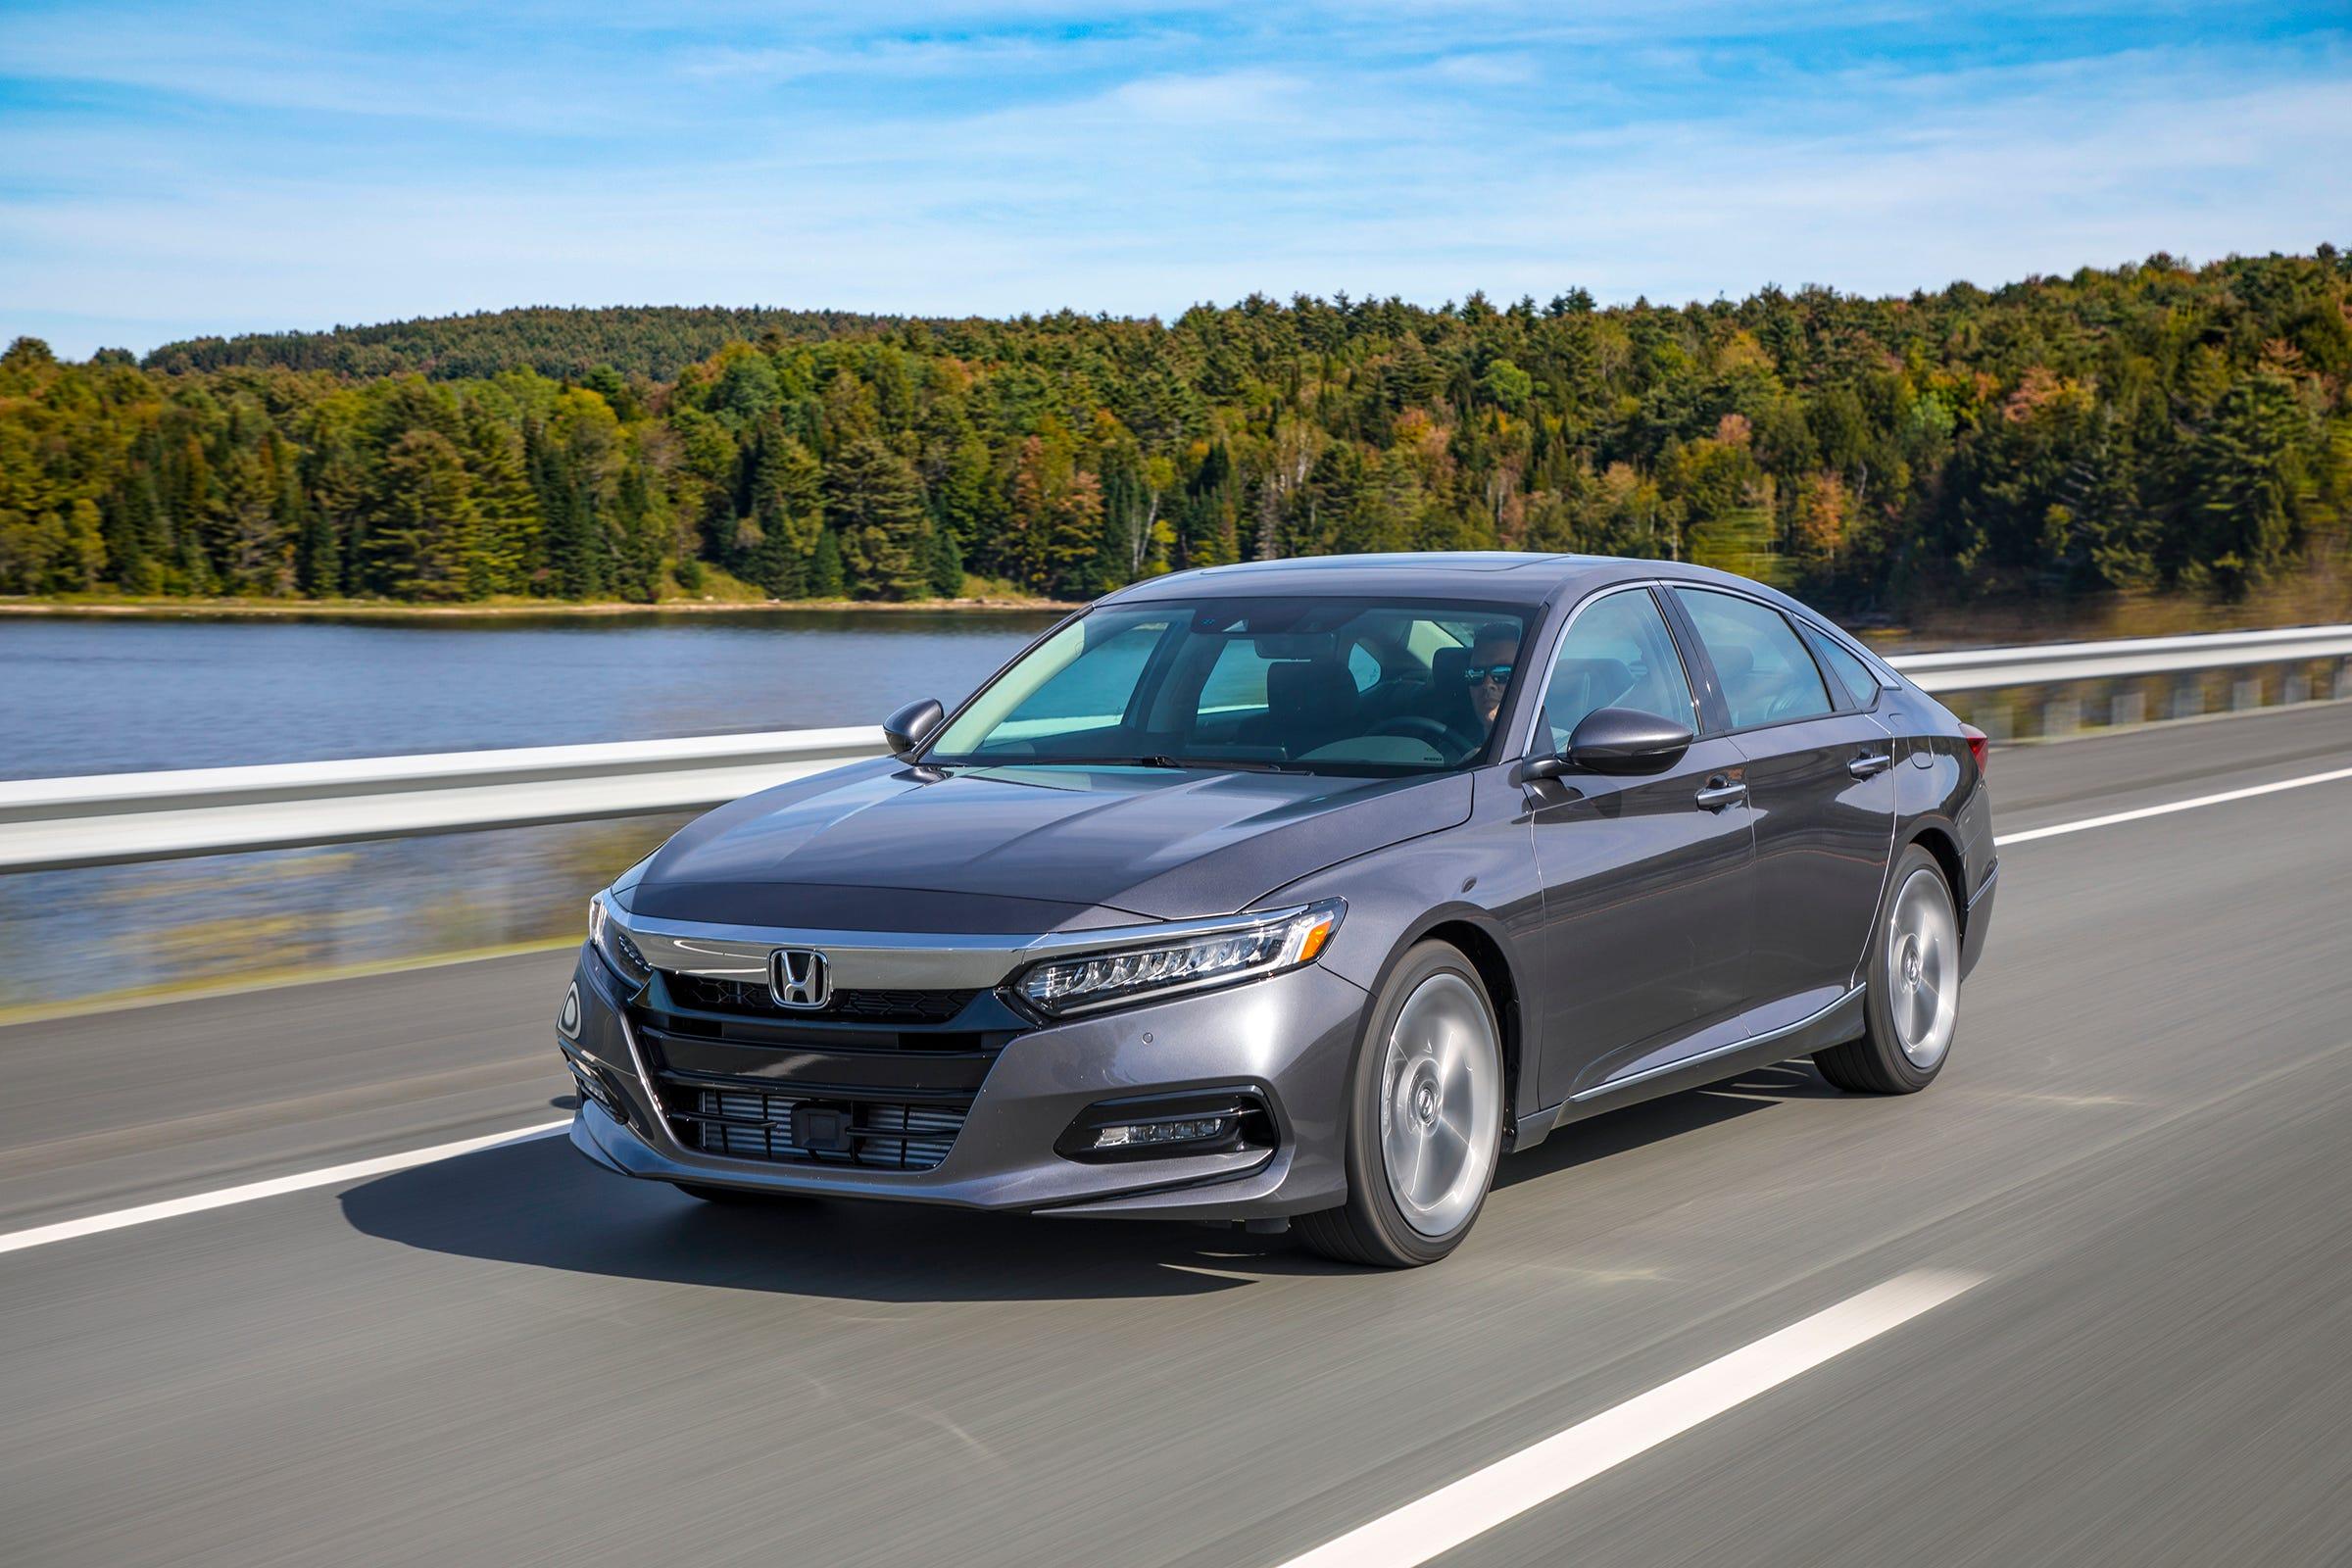 Car of the Year finalist: The Honda Accord